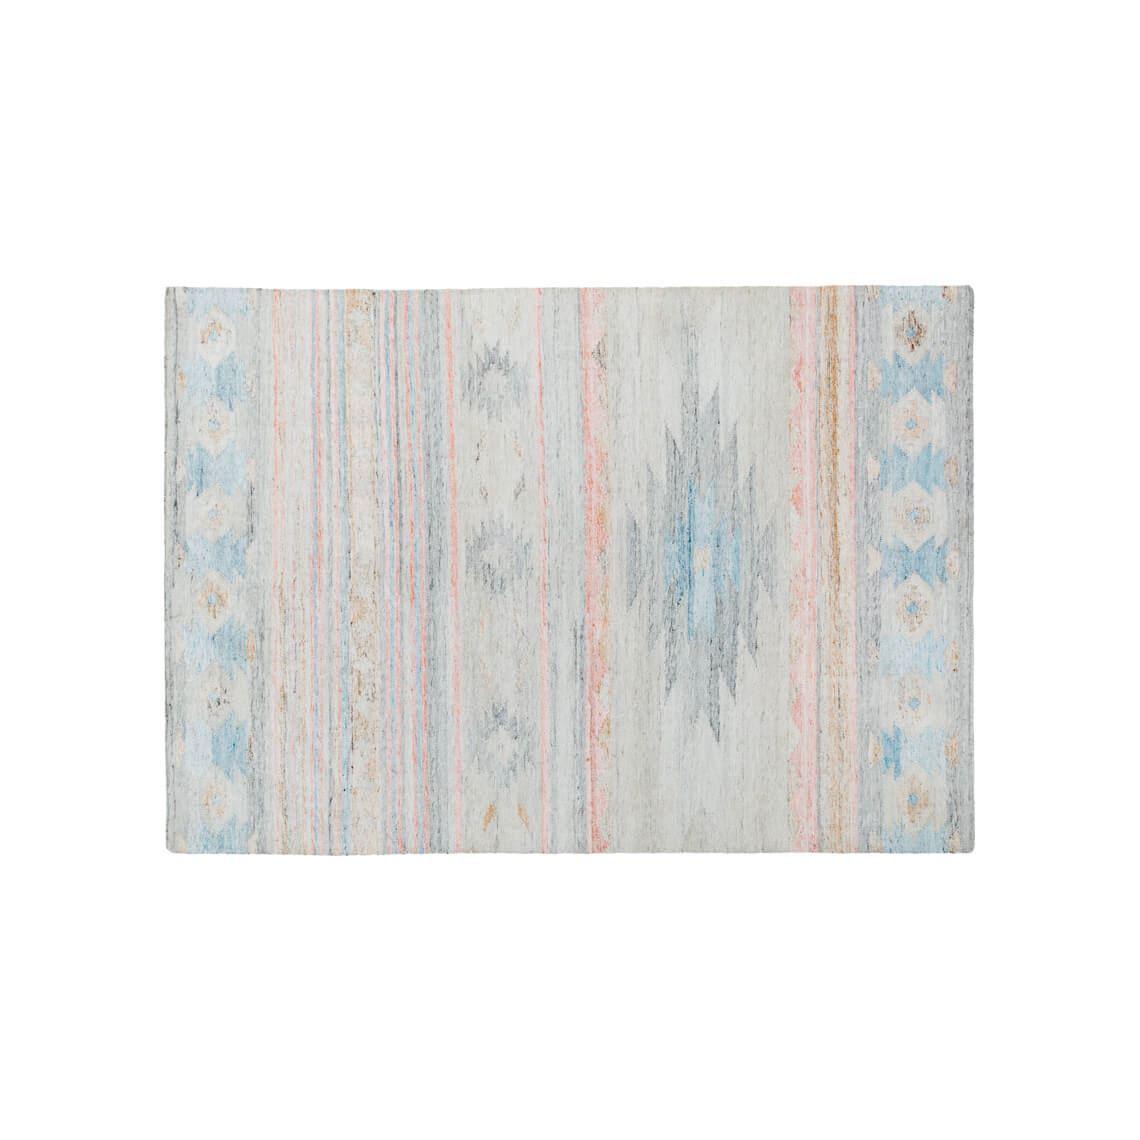 Jakolo Floor Rug Size W 160cm x D 230cm x H 1cm Polyester Freedom